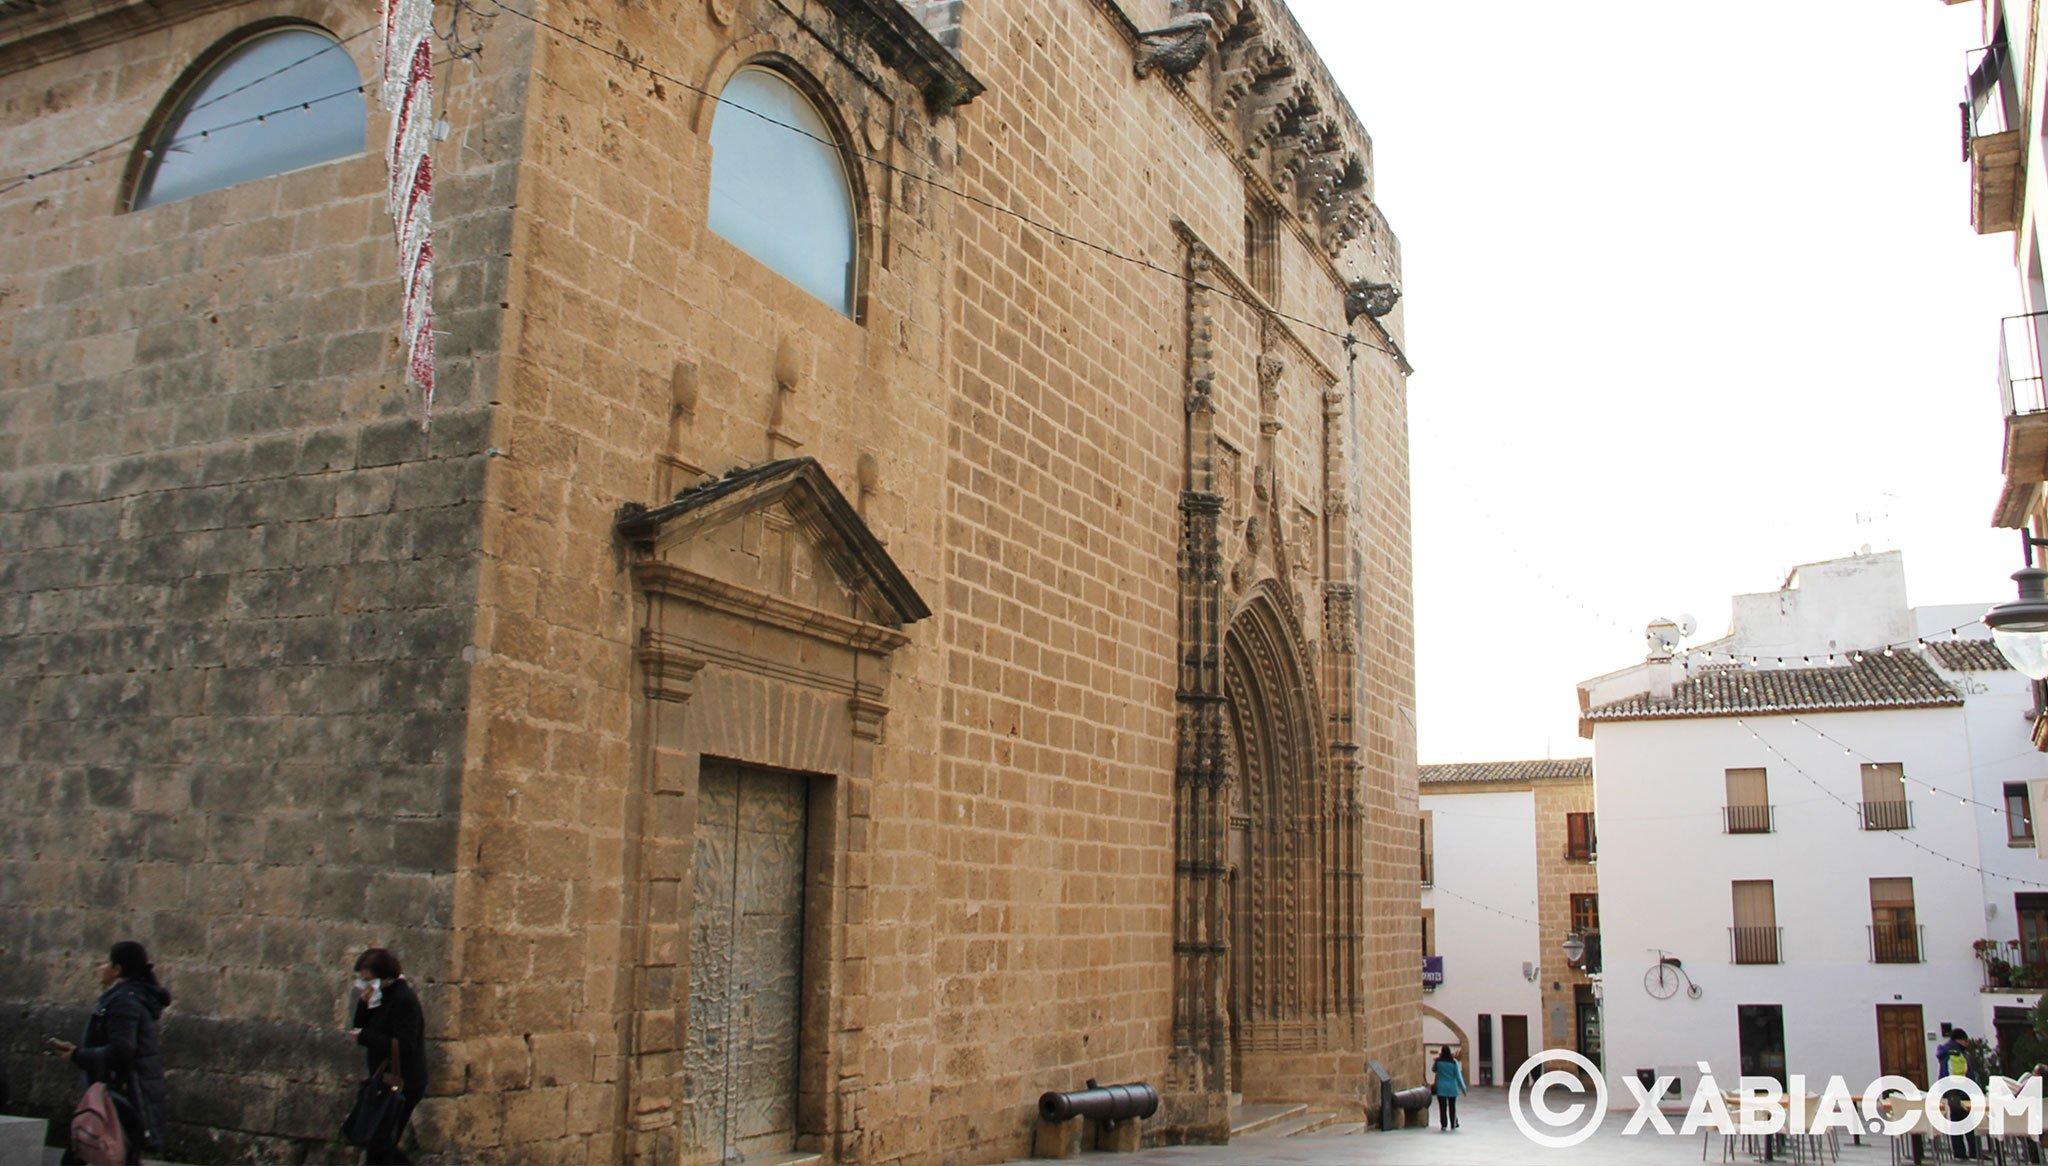 Vista lateral de la entrada principal de la iglesia de San Bartolomé de Xàbia